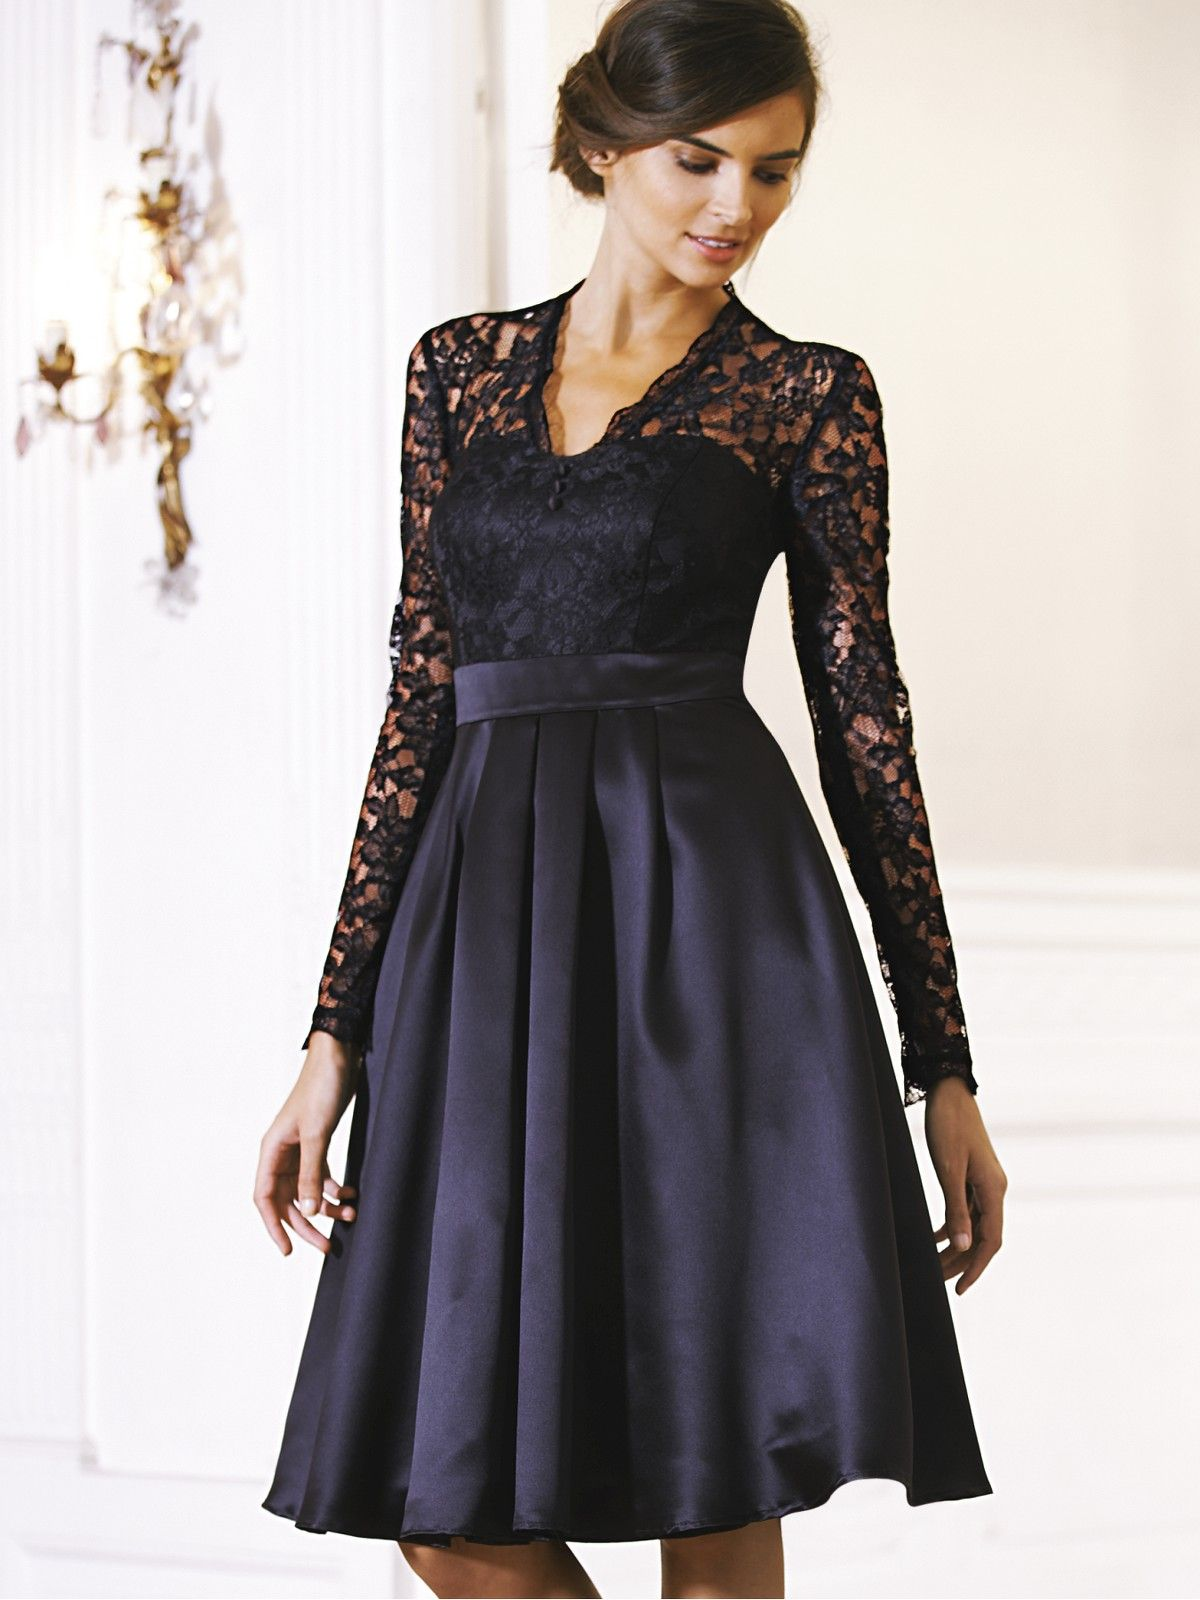 Like A Short Black Version Of Kate Middleton S Wedding Dress